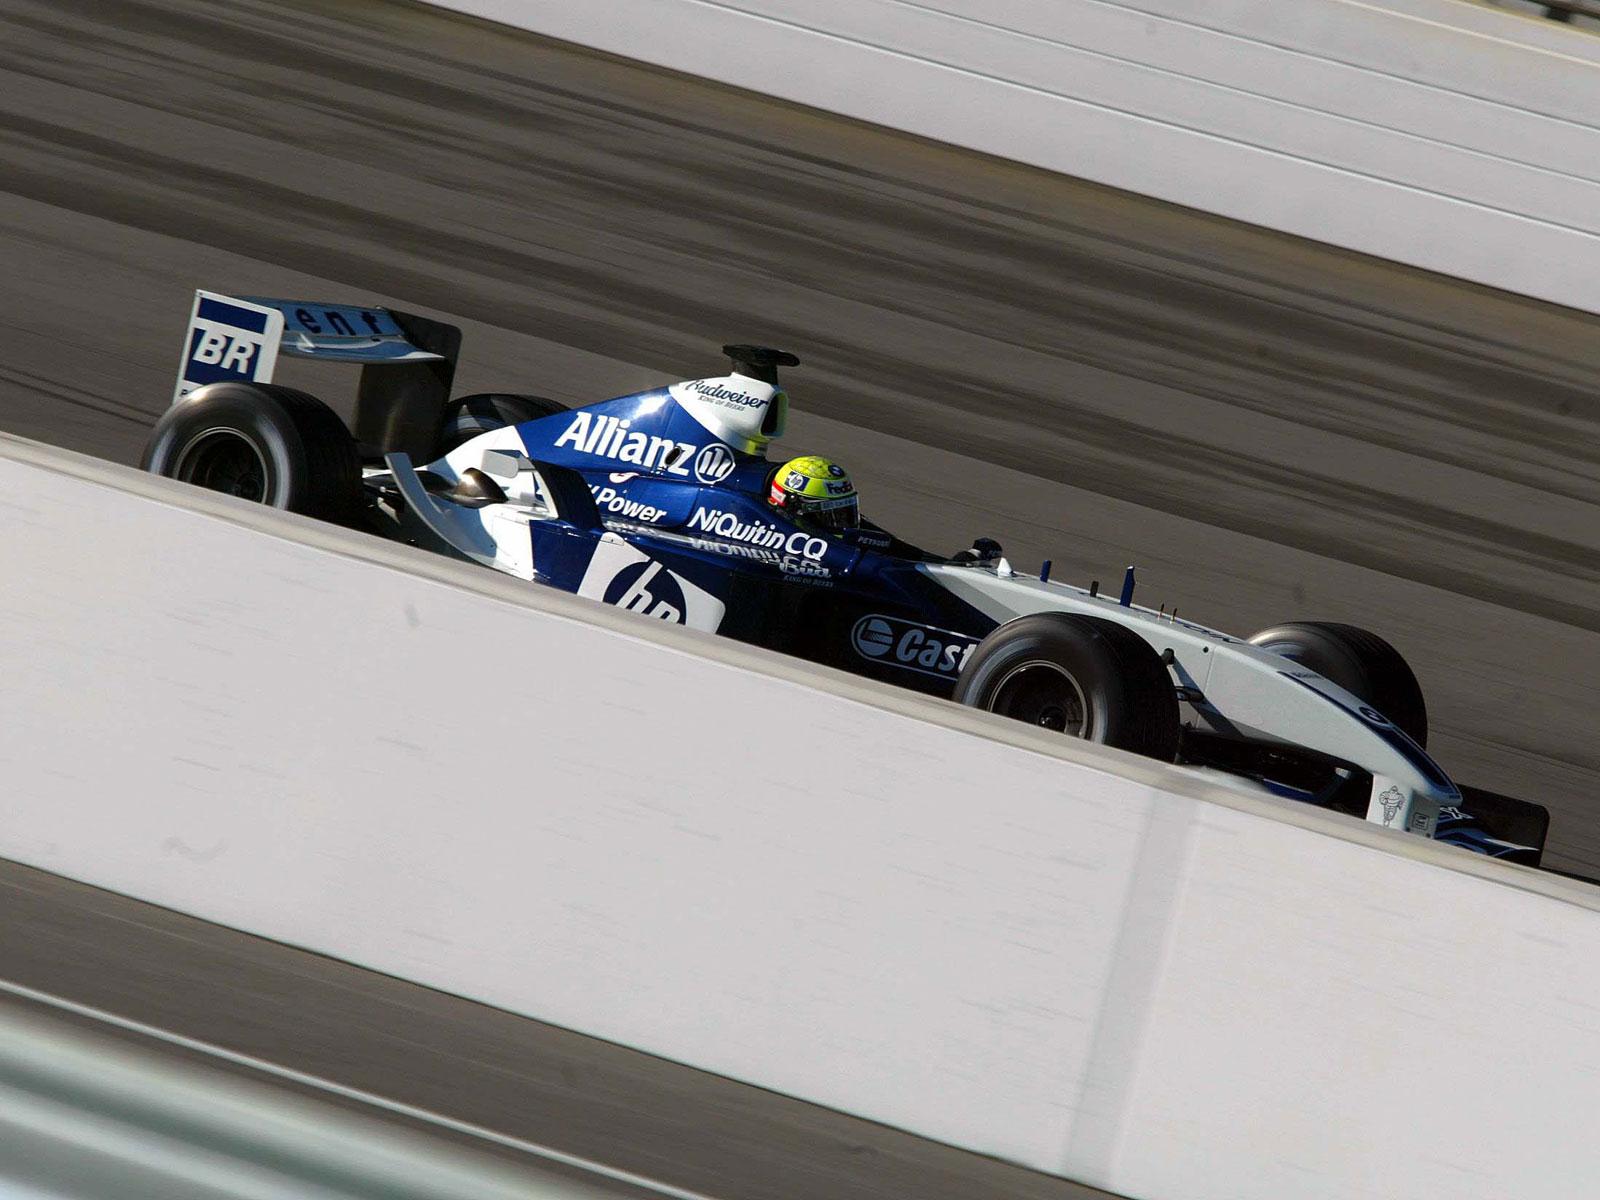 HD Wallpapers 2003 Formula 1 Grand Prix of USA  F1 Fansite